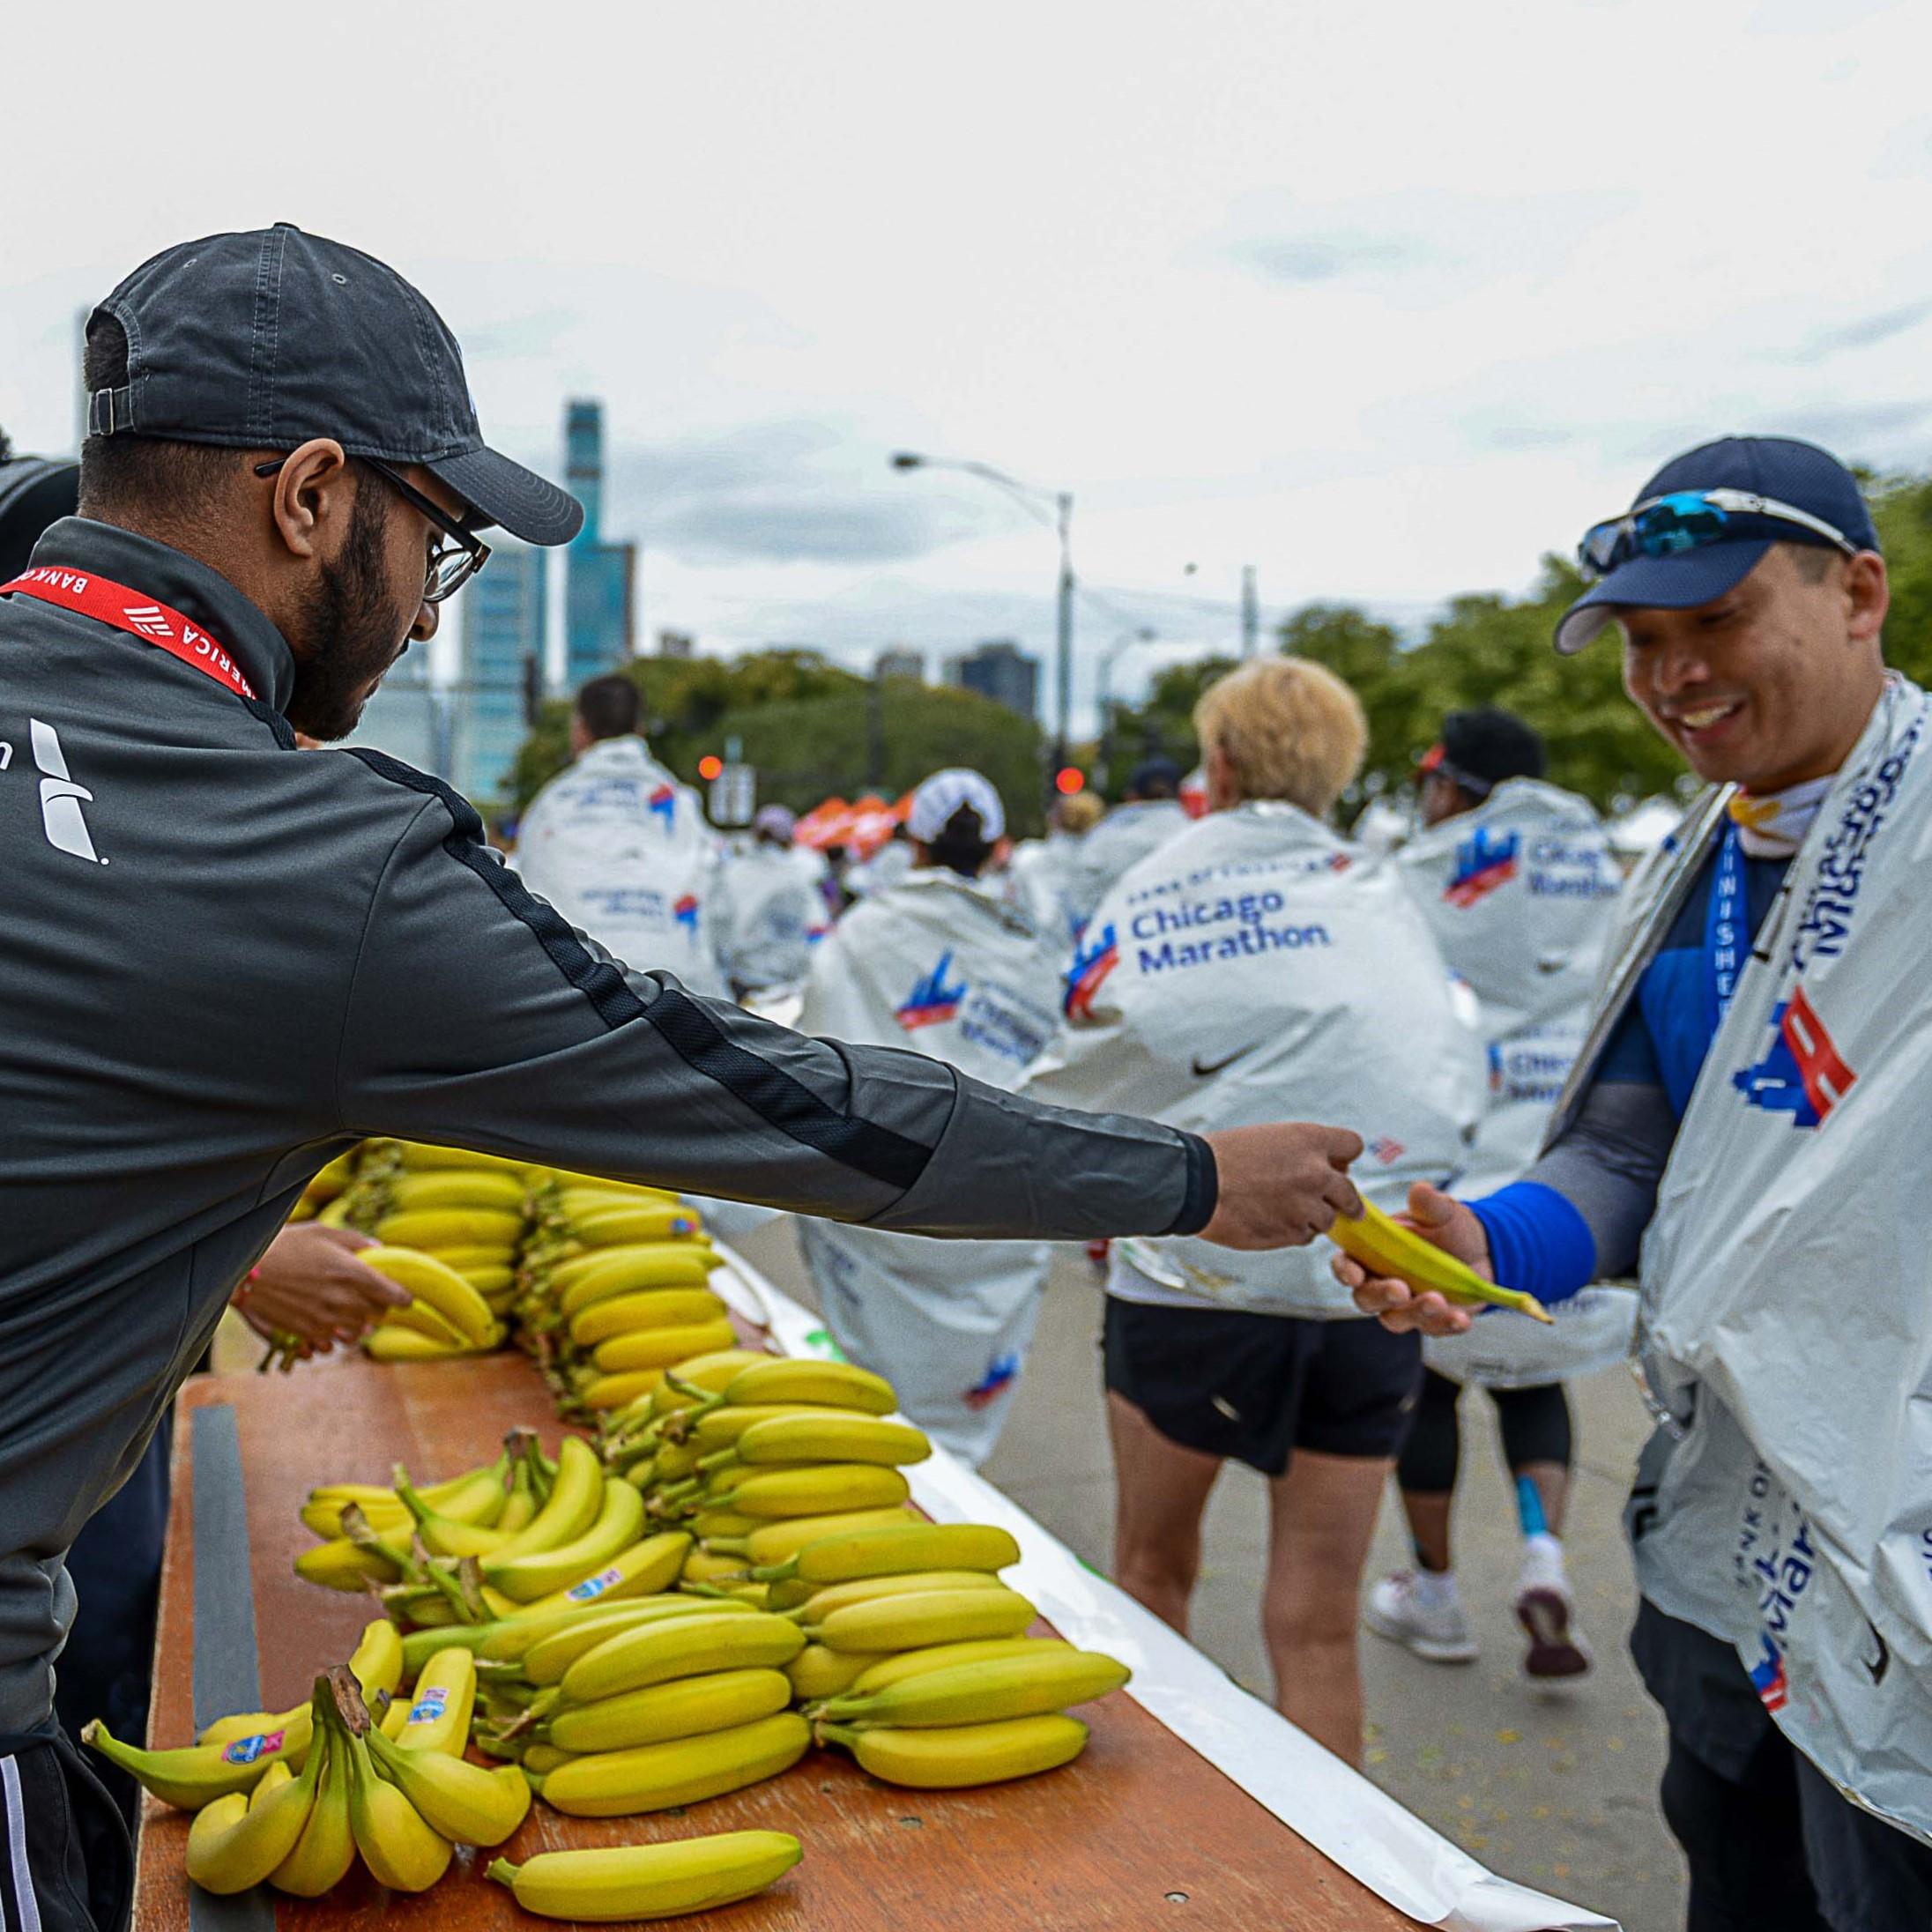 Chicago marathon Chiquita bananas